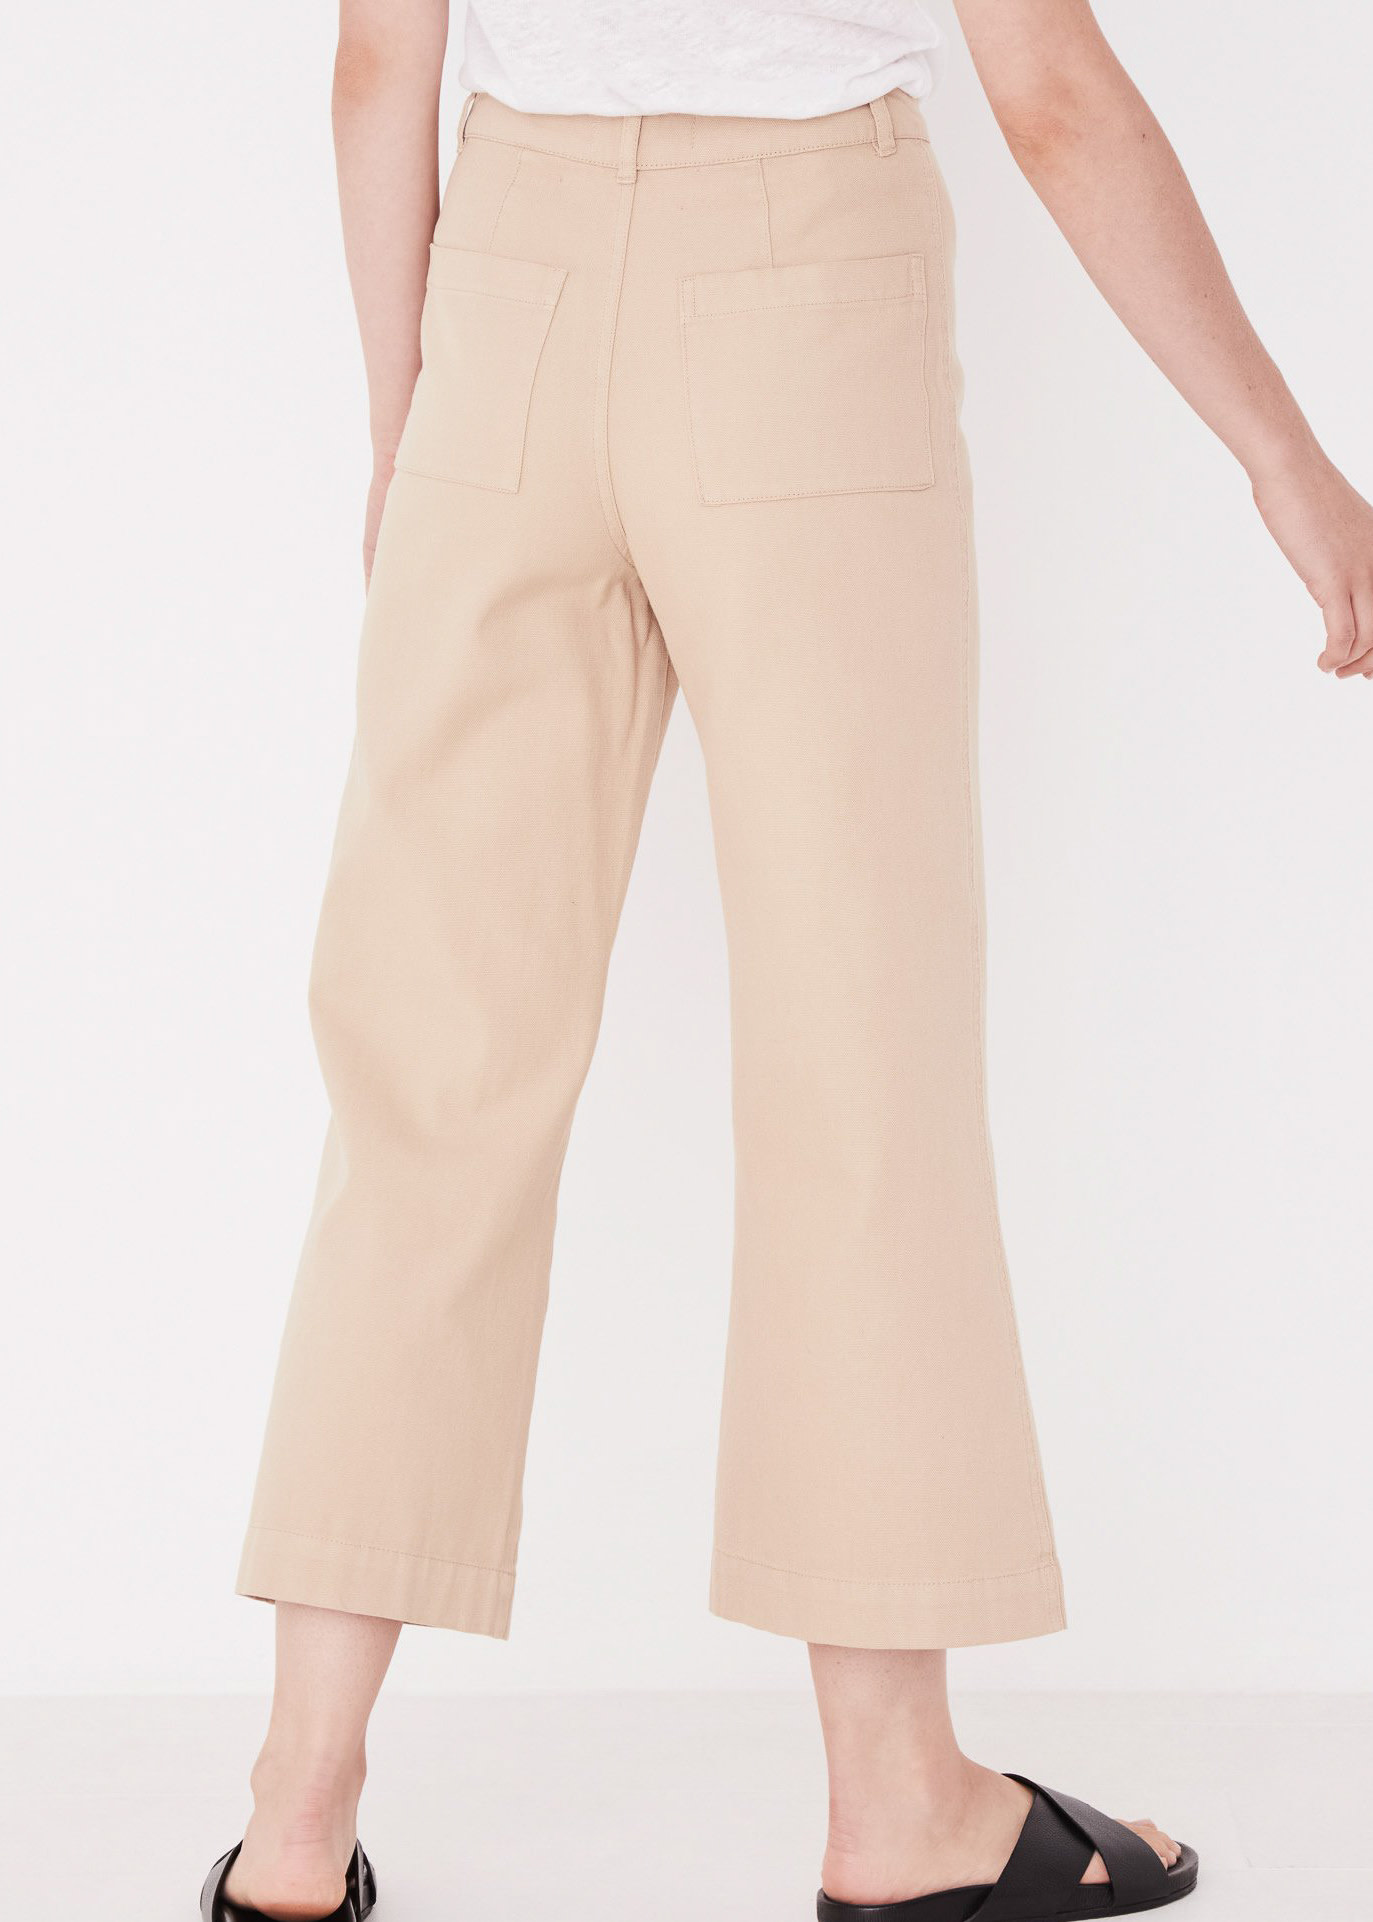 ASSEMBLY LABEL Tala Wide Leg pantalon